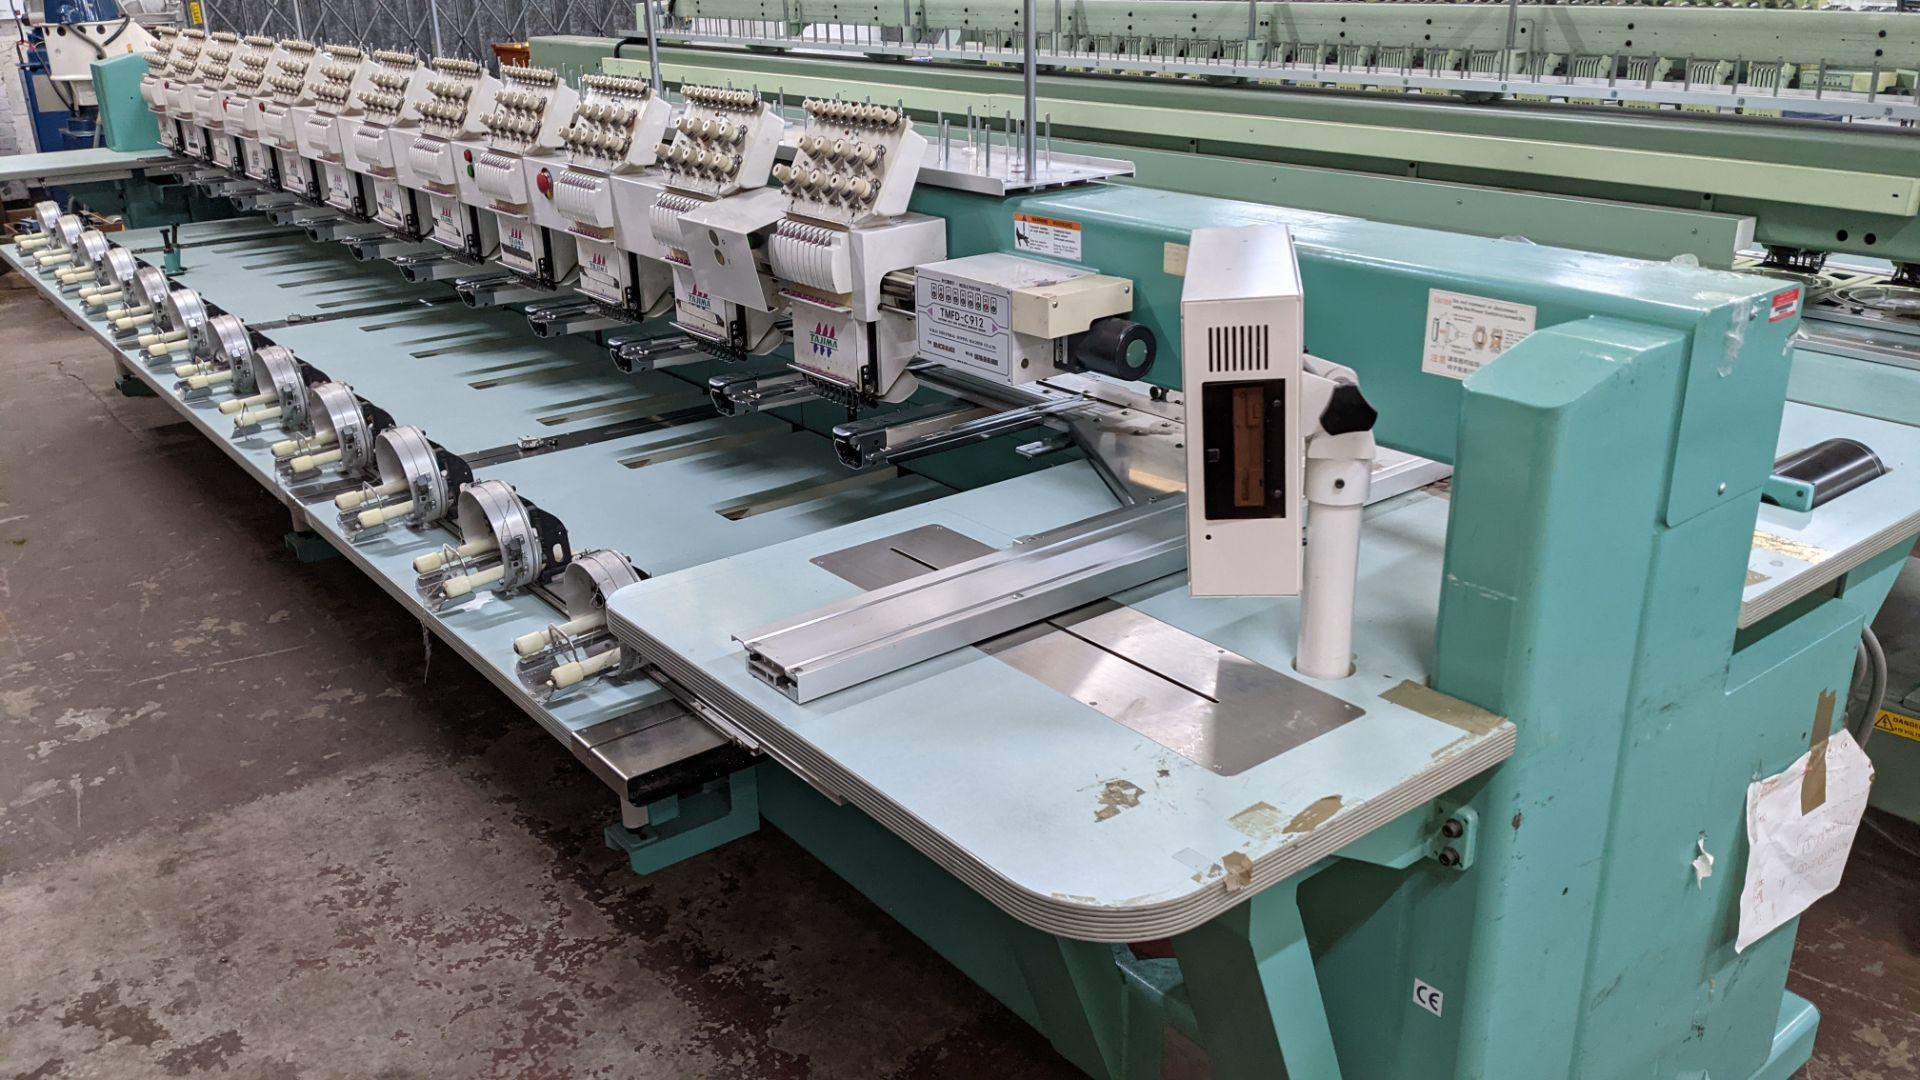 Tokai Tajima model TMFD-C912 electronic 12 head embroidery machine, type 2-2FX - Image 10 of 27